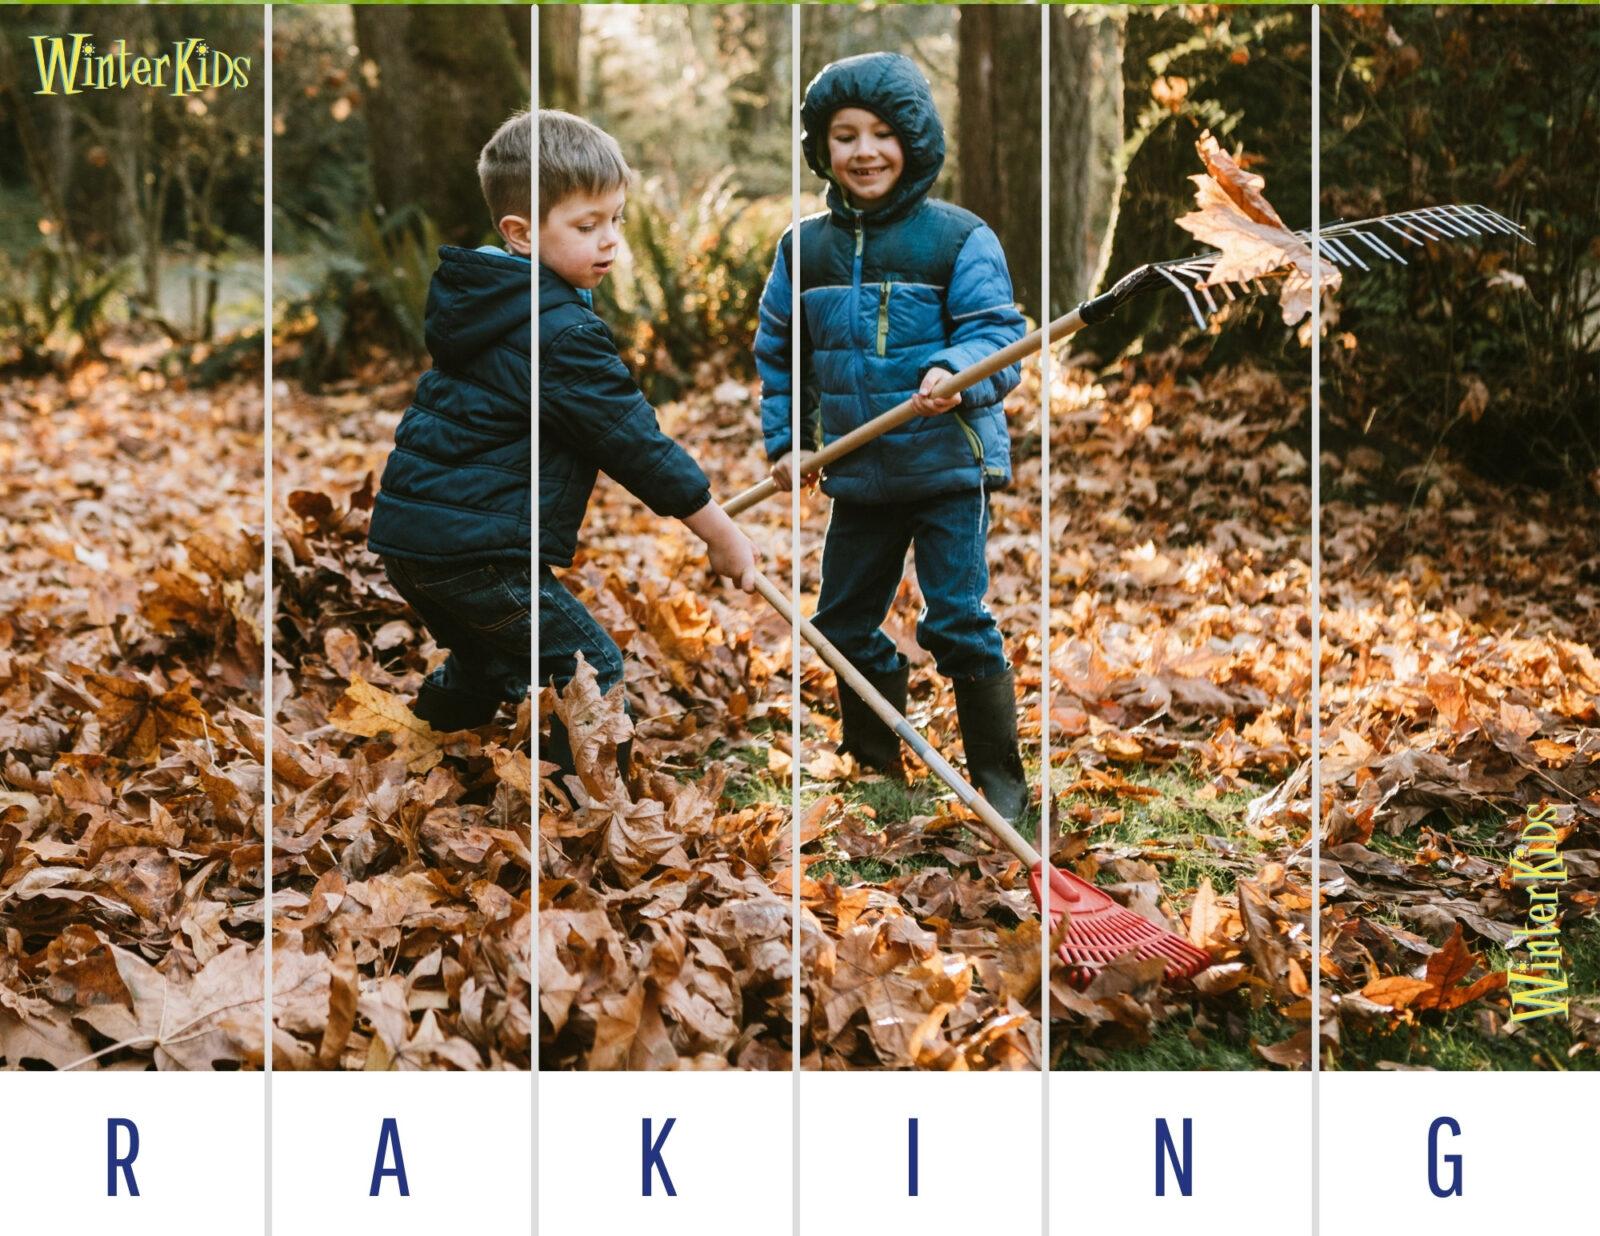 Autumn Fun Puzzles WinterKids 13